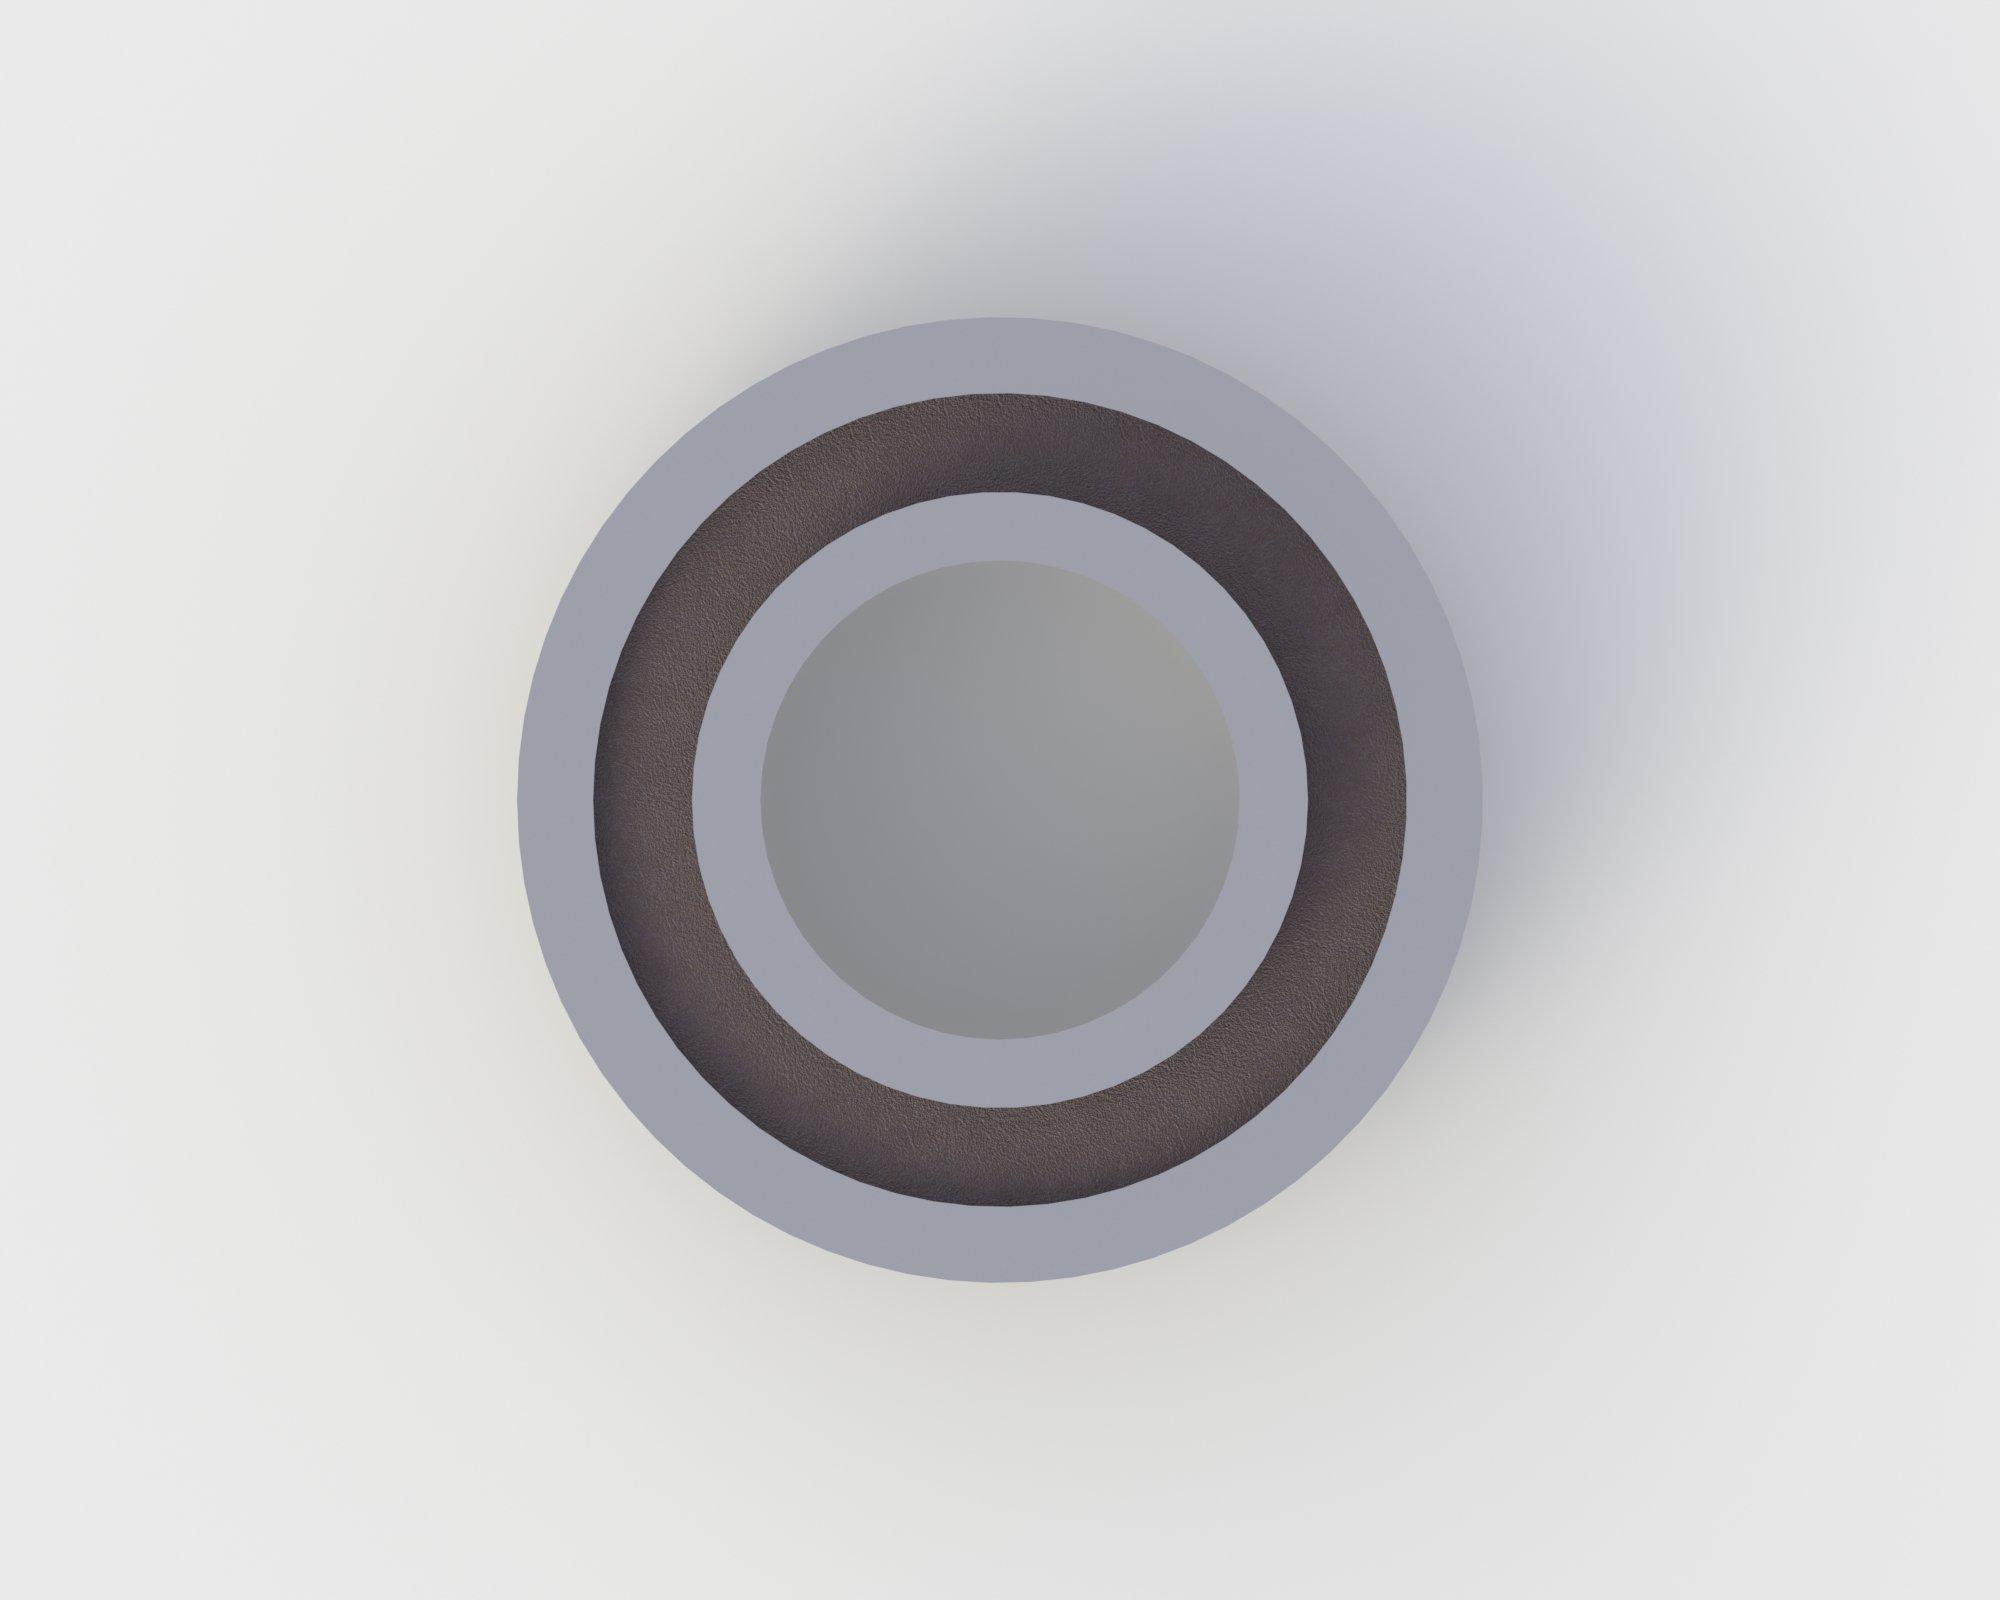 Kavo 635B / 635BR / 637B Rear Bearing - Ceramic